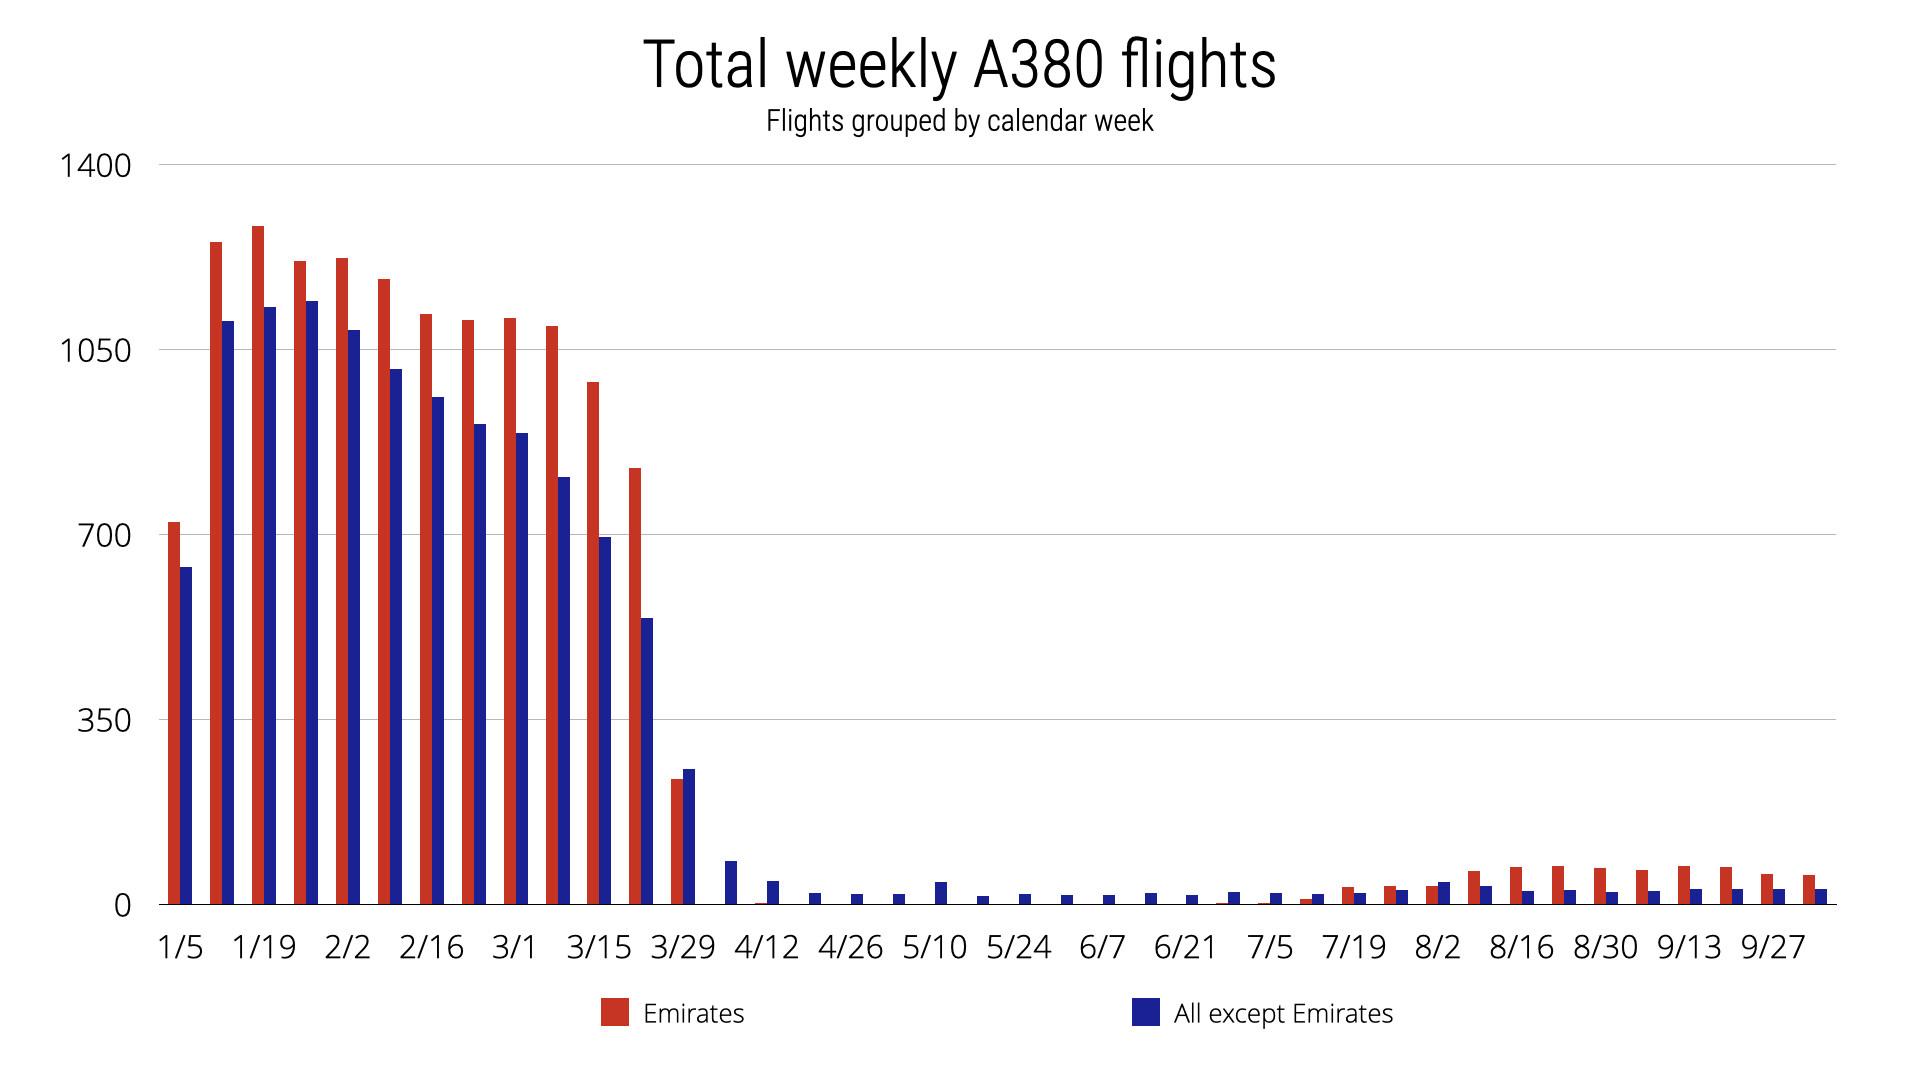 Weekly Flights Emirates vs Non-Emirates